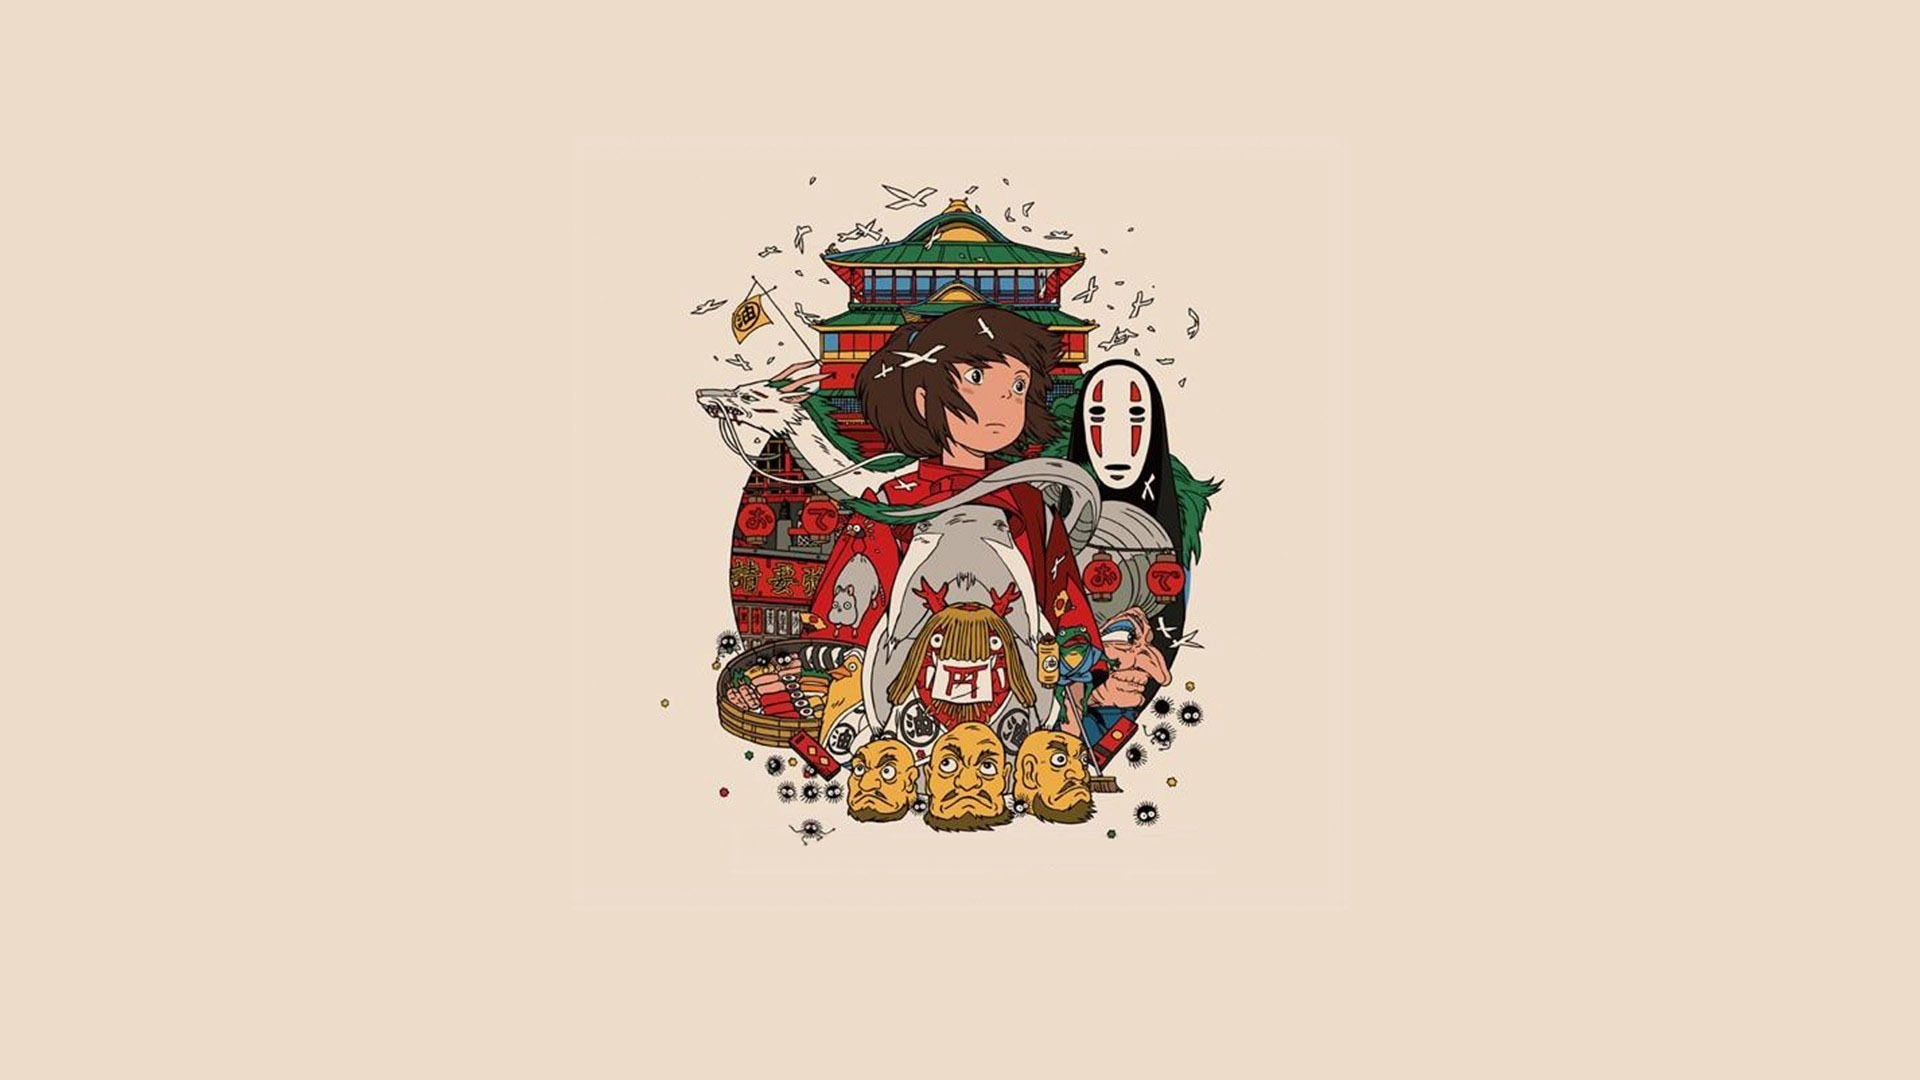 spirited away wallpaper - google search | anime | pinterest